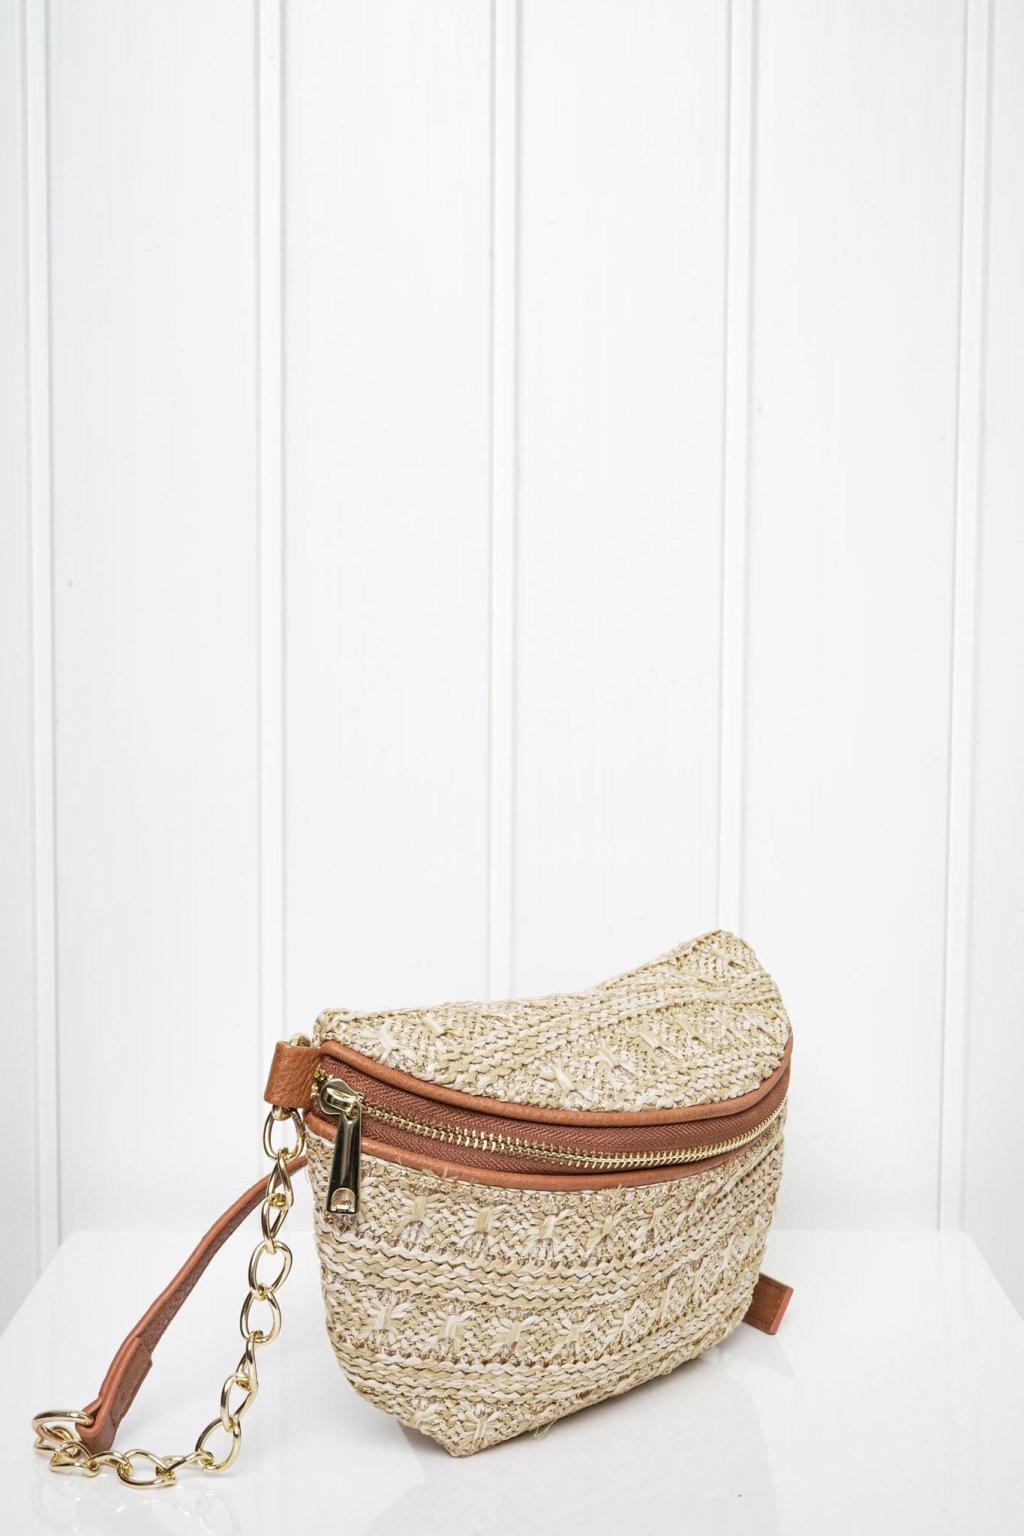 Kabelka, crossbody, ruksak, shopping bag, shopperka, 339